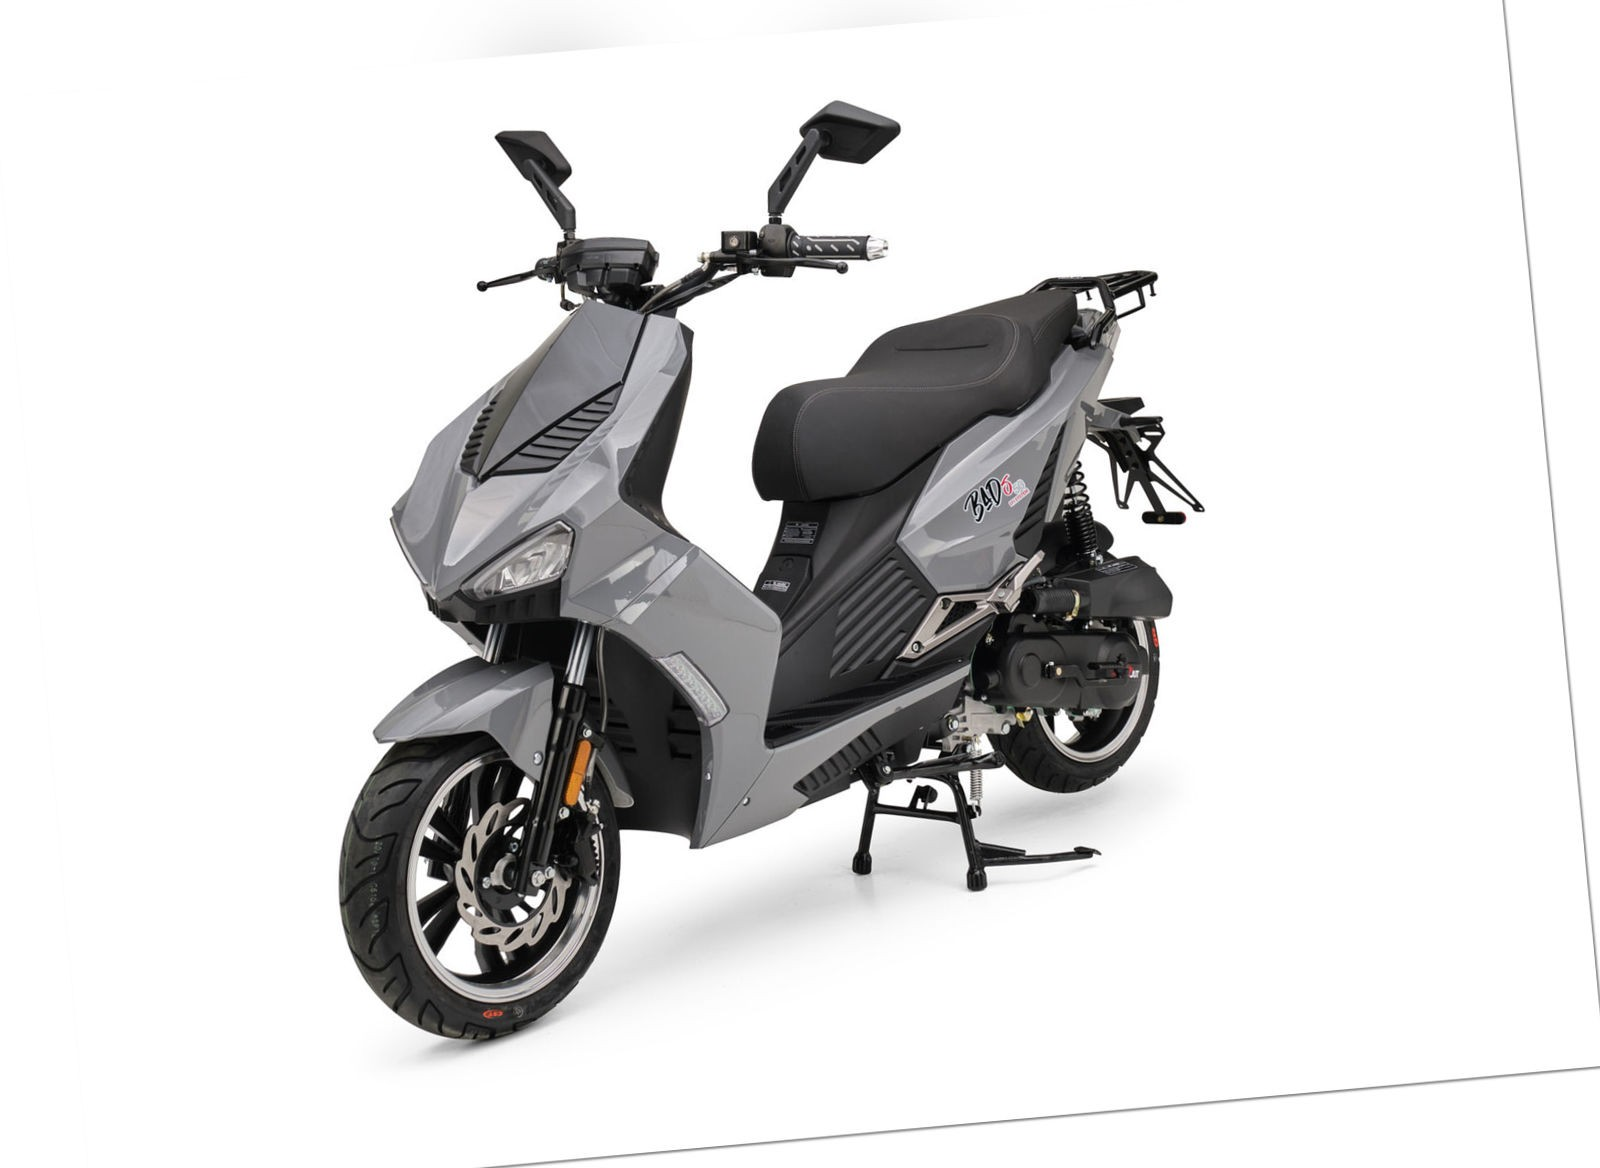 BAD S Grau 49cc Sport Motorroller Roller Moped